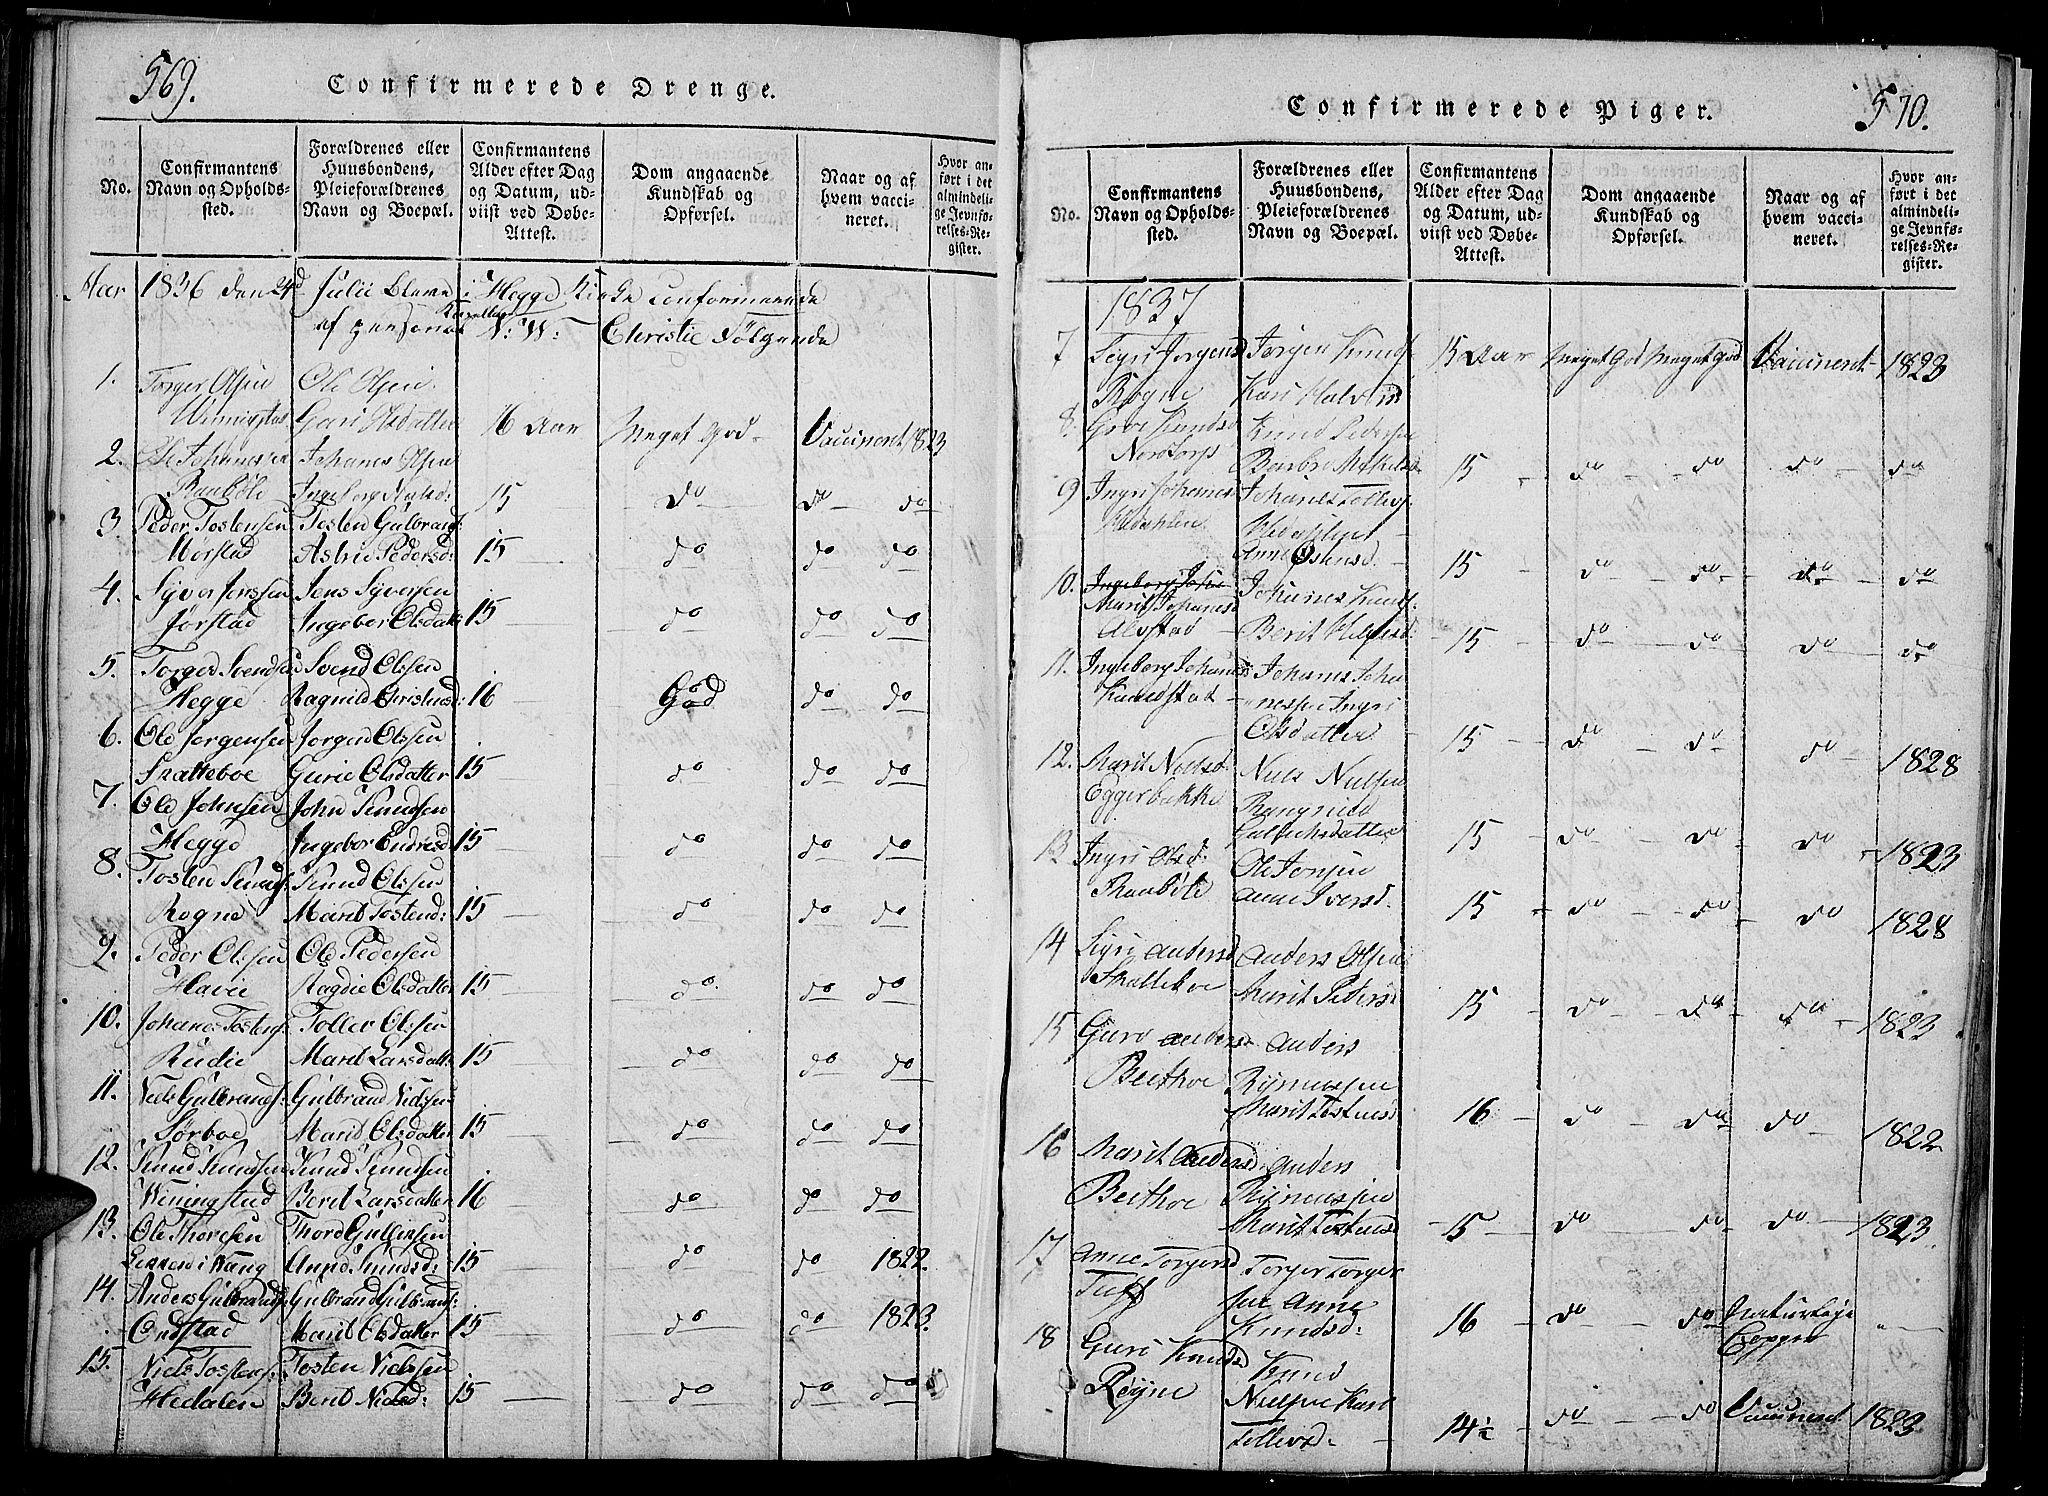 SAH, Slidre prestekontor, Klokkerbok nr. 2, 1814-1839, s. 569-570